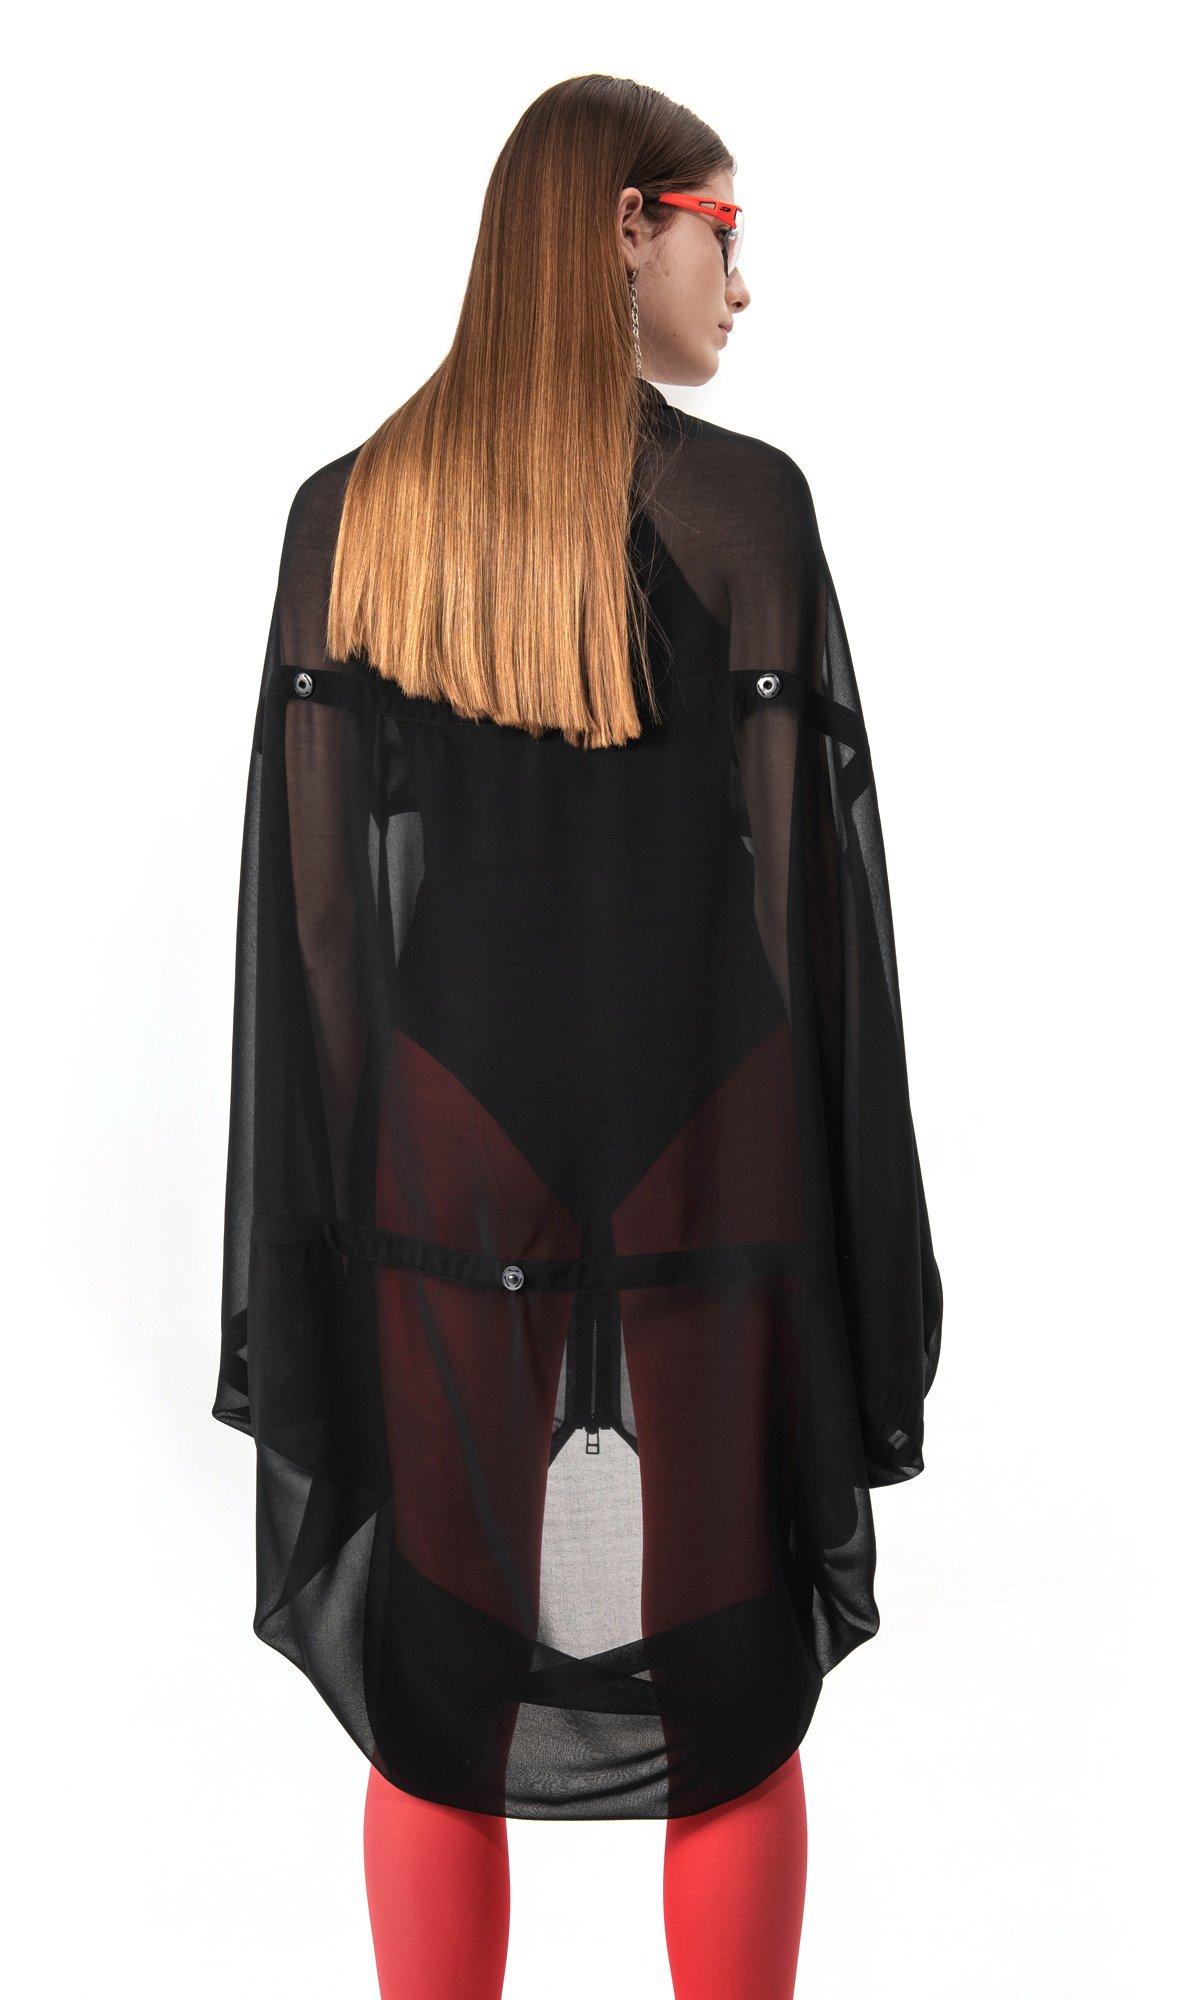 Adjustable Sheer Zipper Blouse